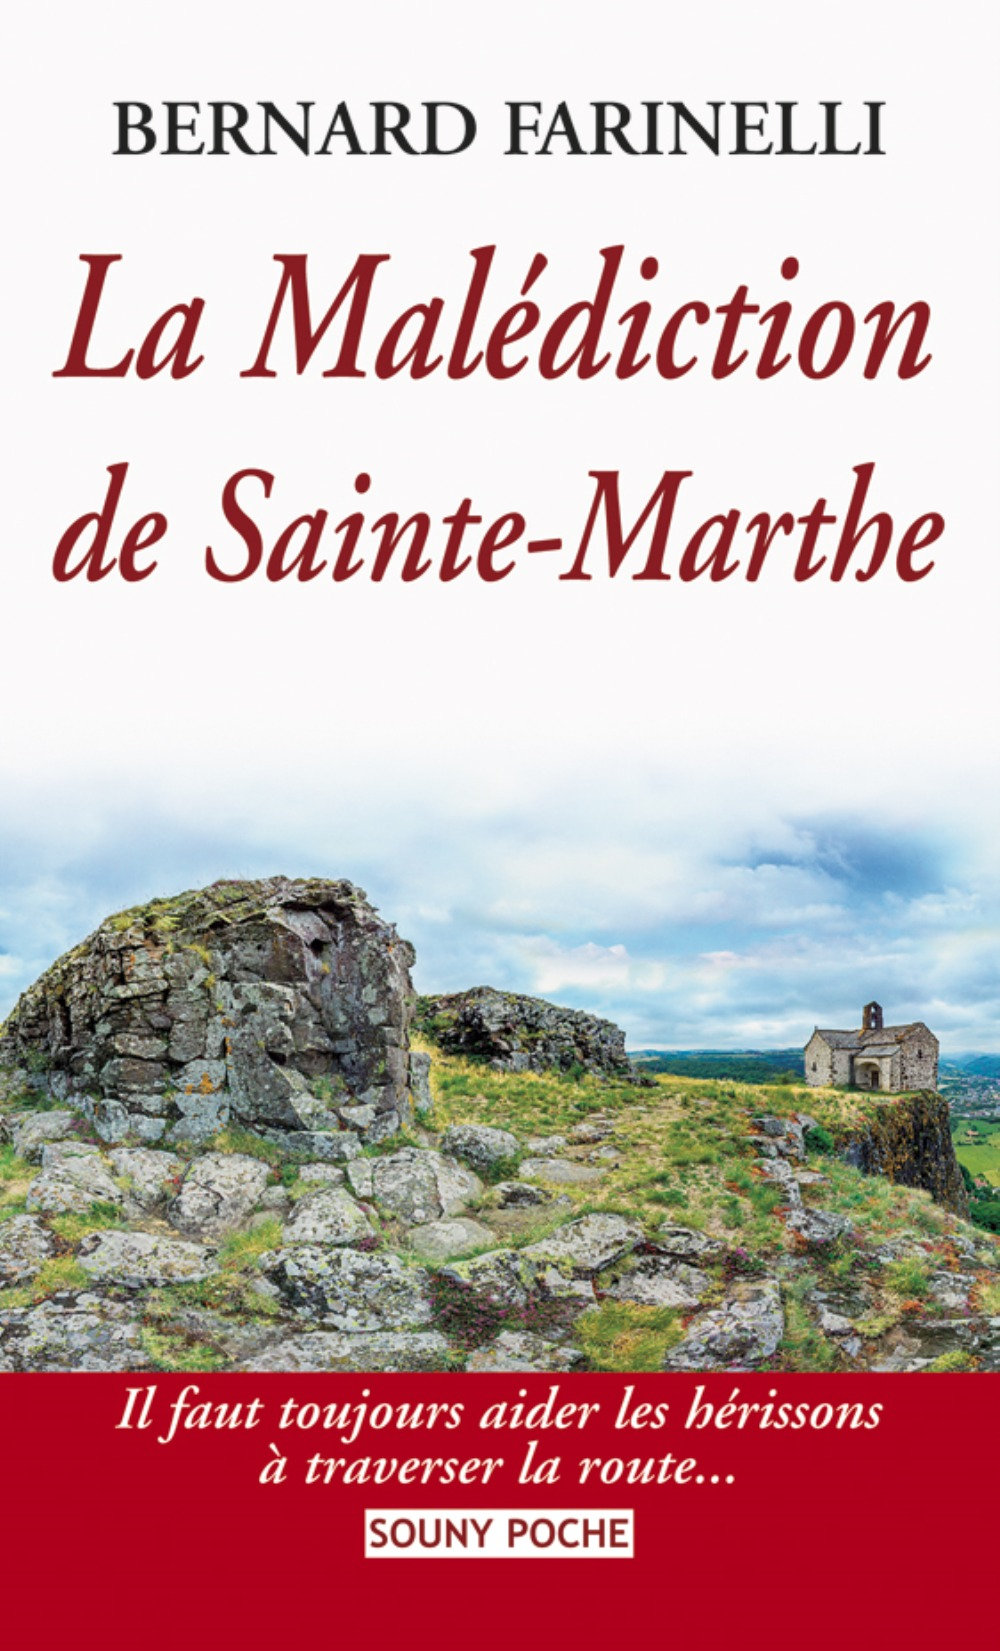 La Malédiction de Sainte-Marthe